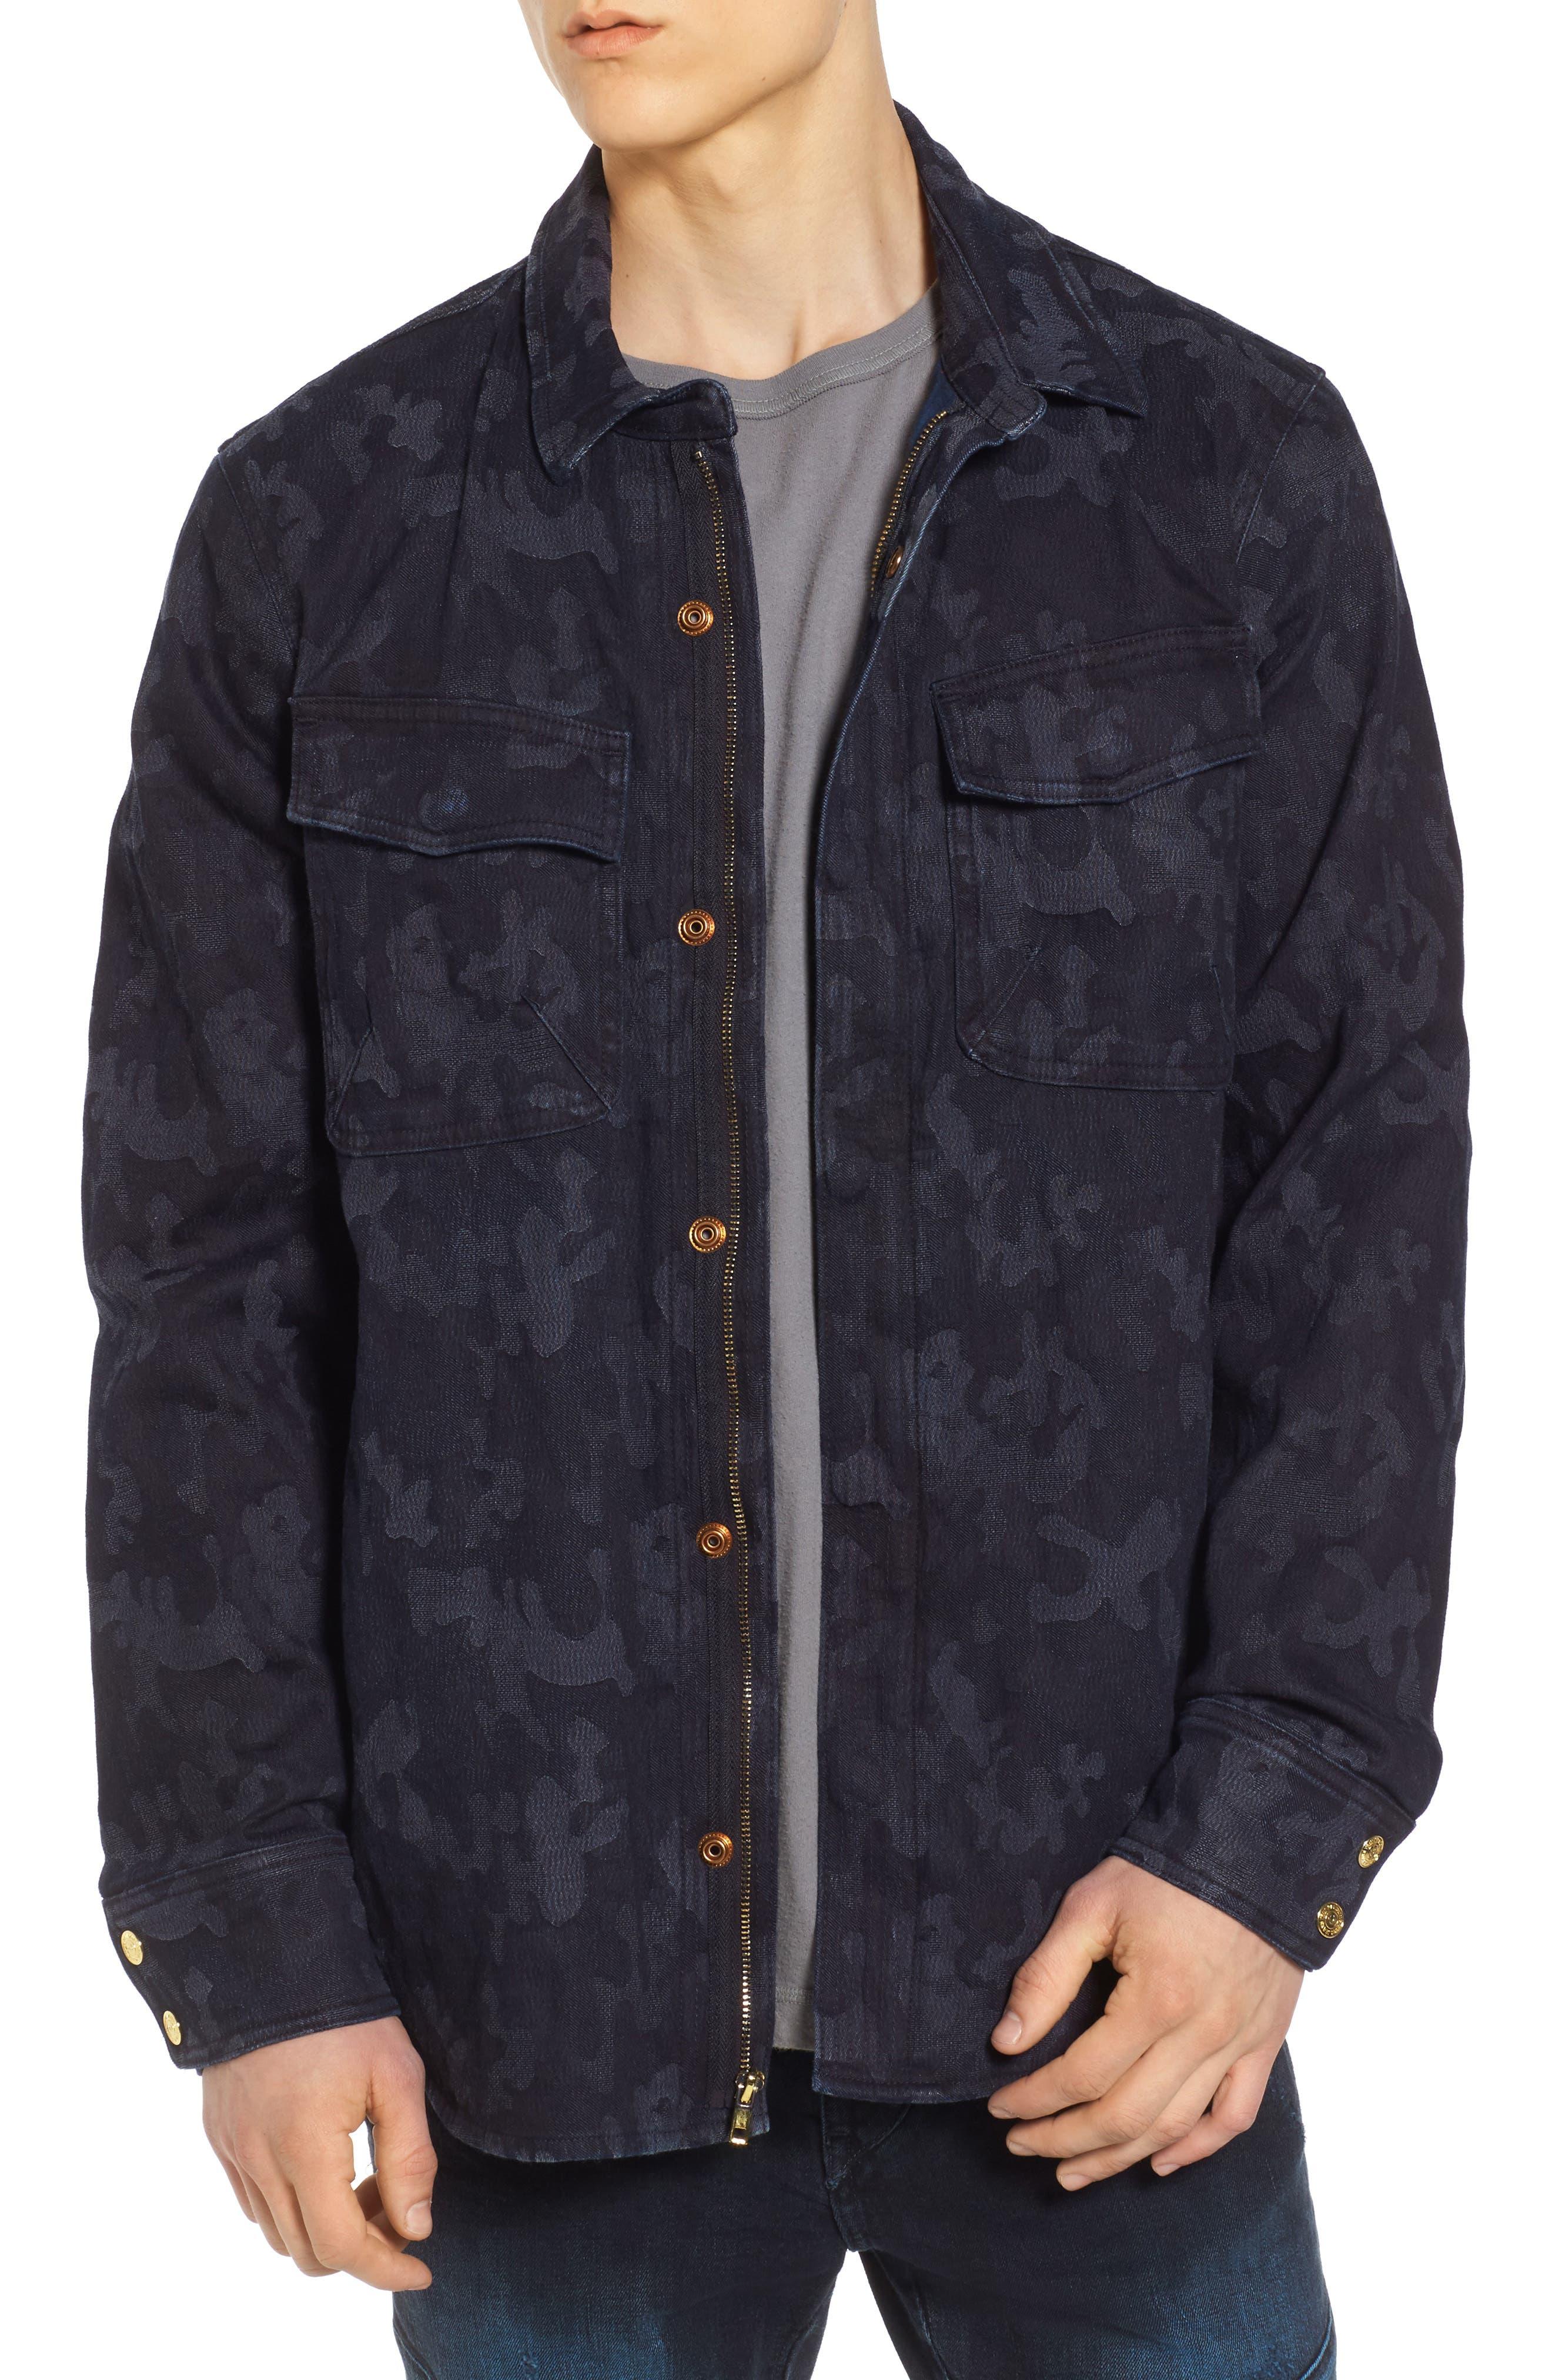 Main Image - True Religion Brand Jeans Camo Field Jacket